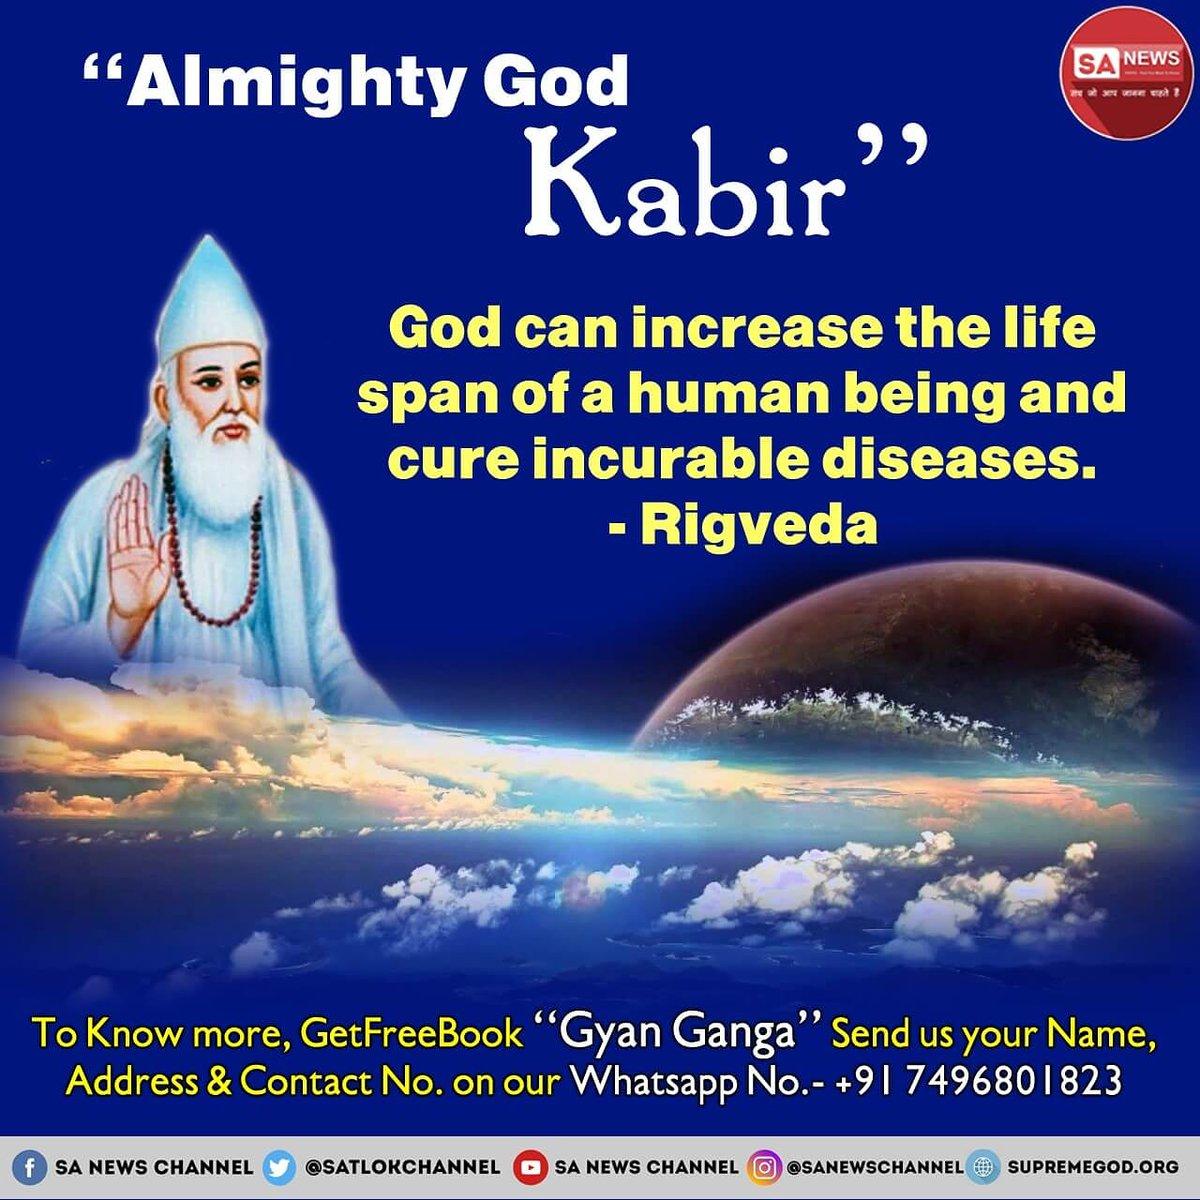 #GodMorningMonday #mondaythoughts #MondayMotivation Holy Kuran says Allah name is Kabir.  For more detail must watch Sadhna tv from 19:30 to 20:30 (IST)